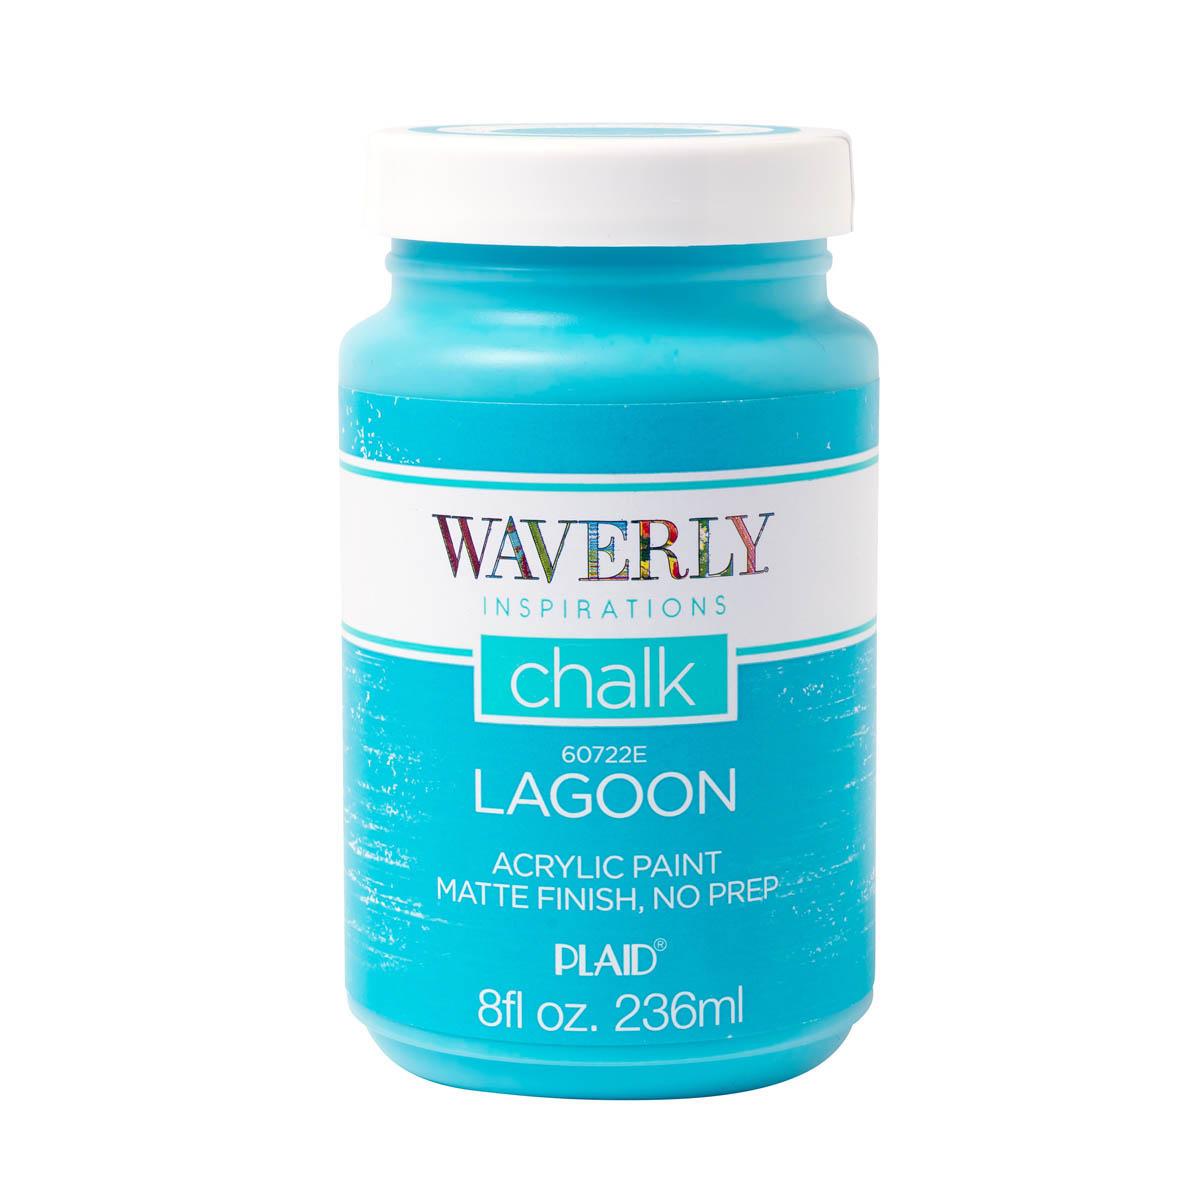 Waverly ® Inspirations Chalk Acrylic Paint - Lagoon, 8 oz.